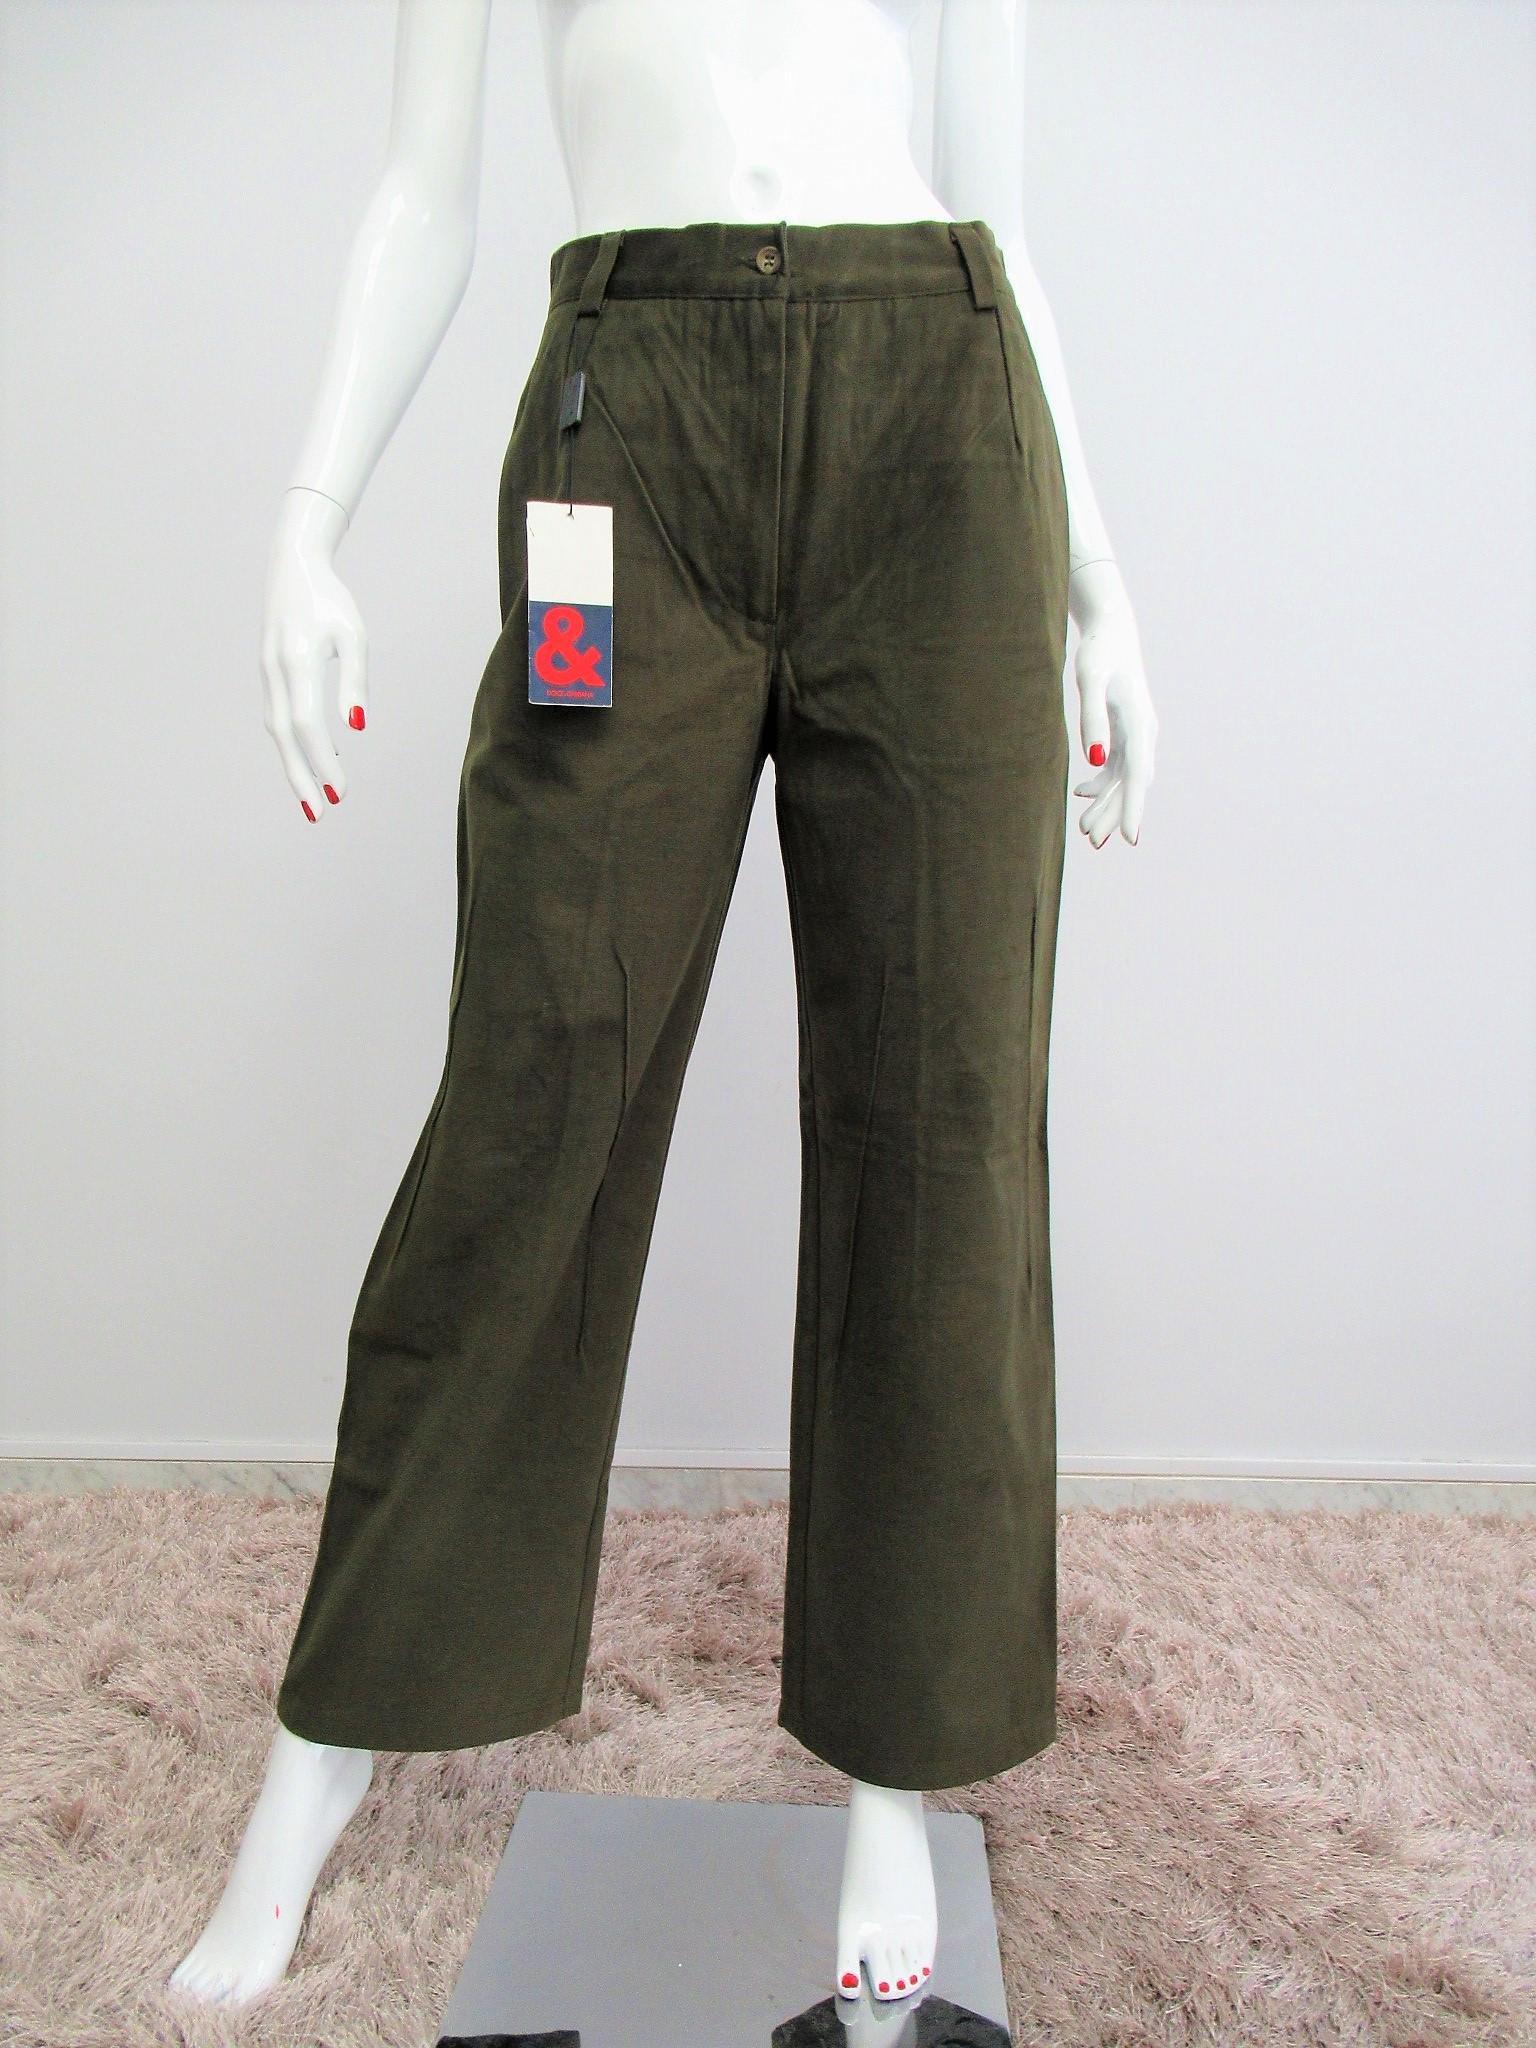 """Dolce & Gabbana"" moleskin trousers size S"